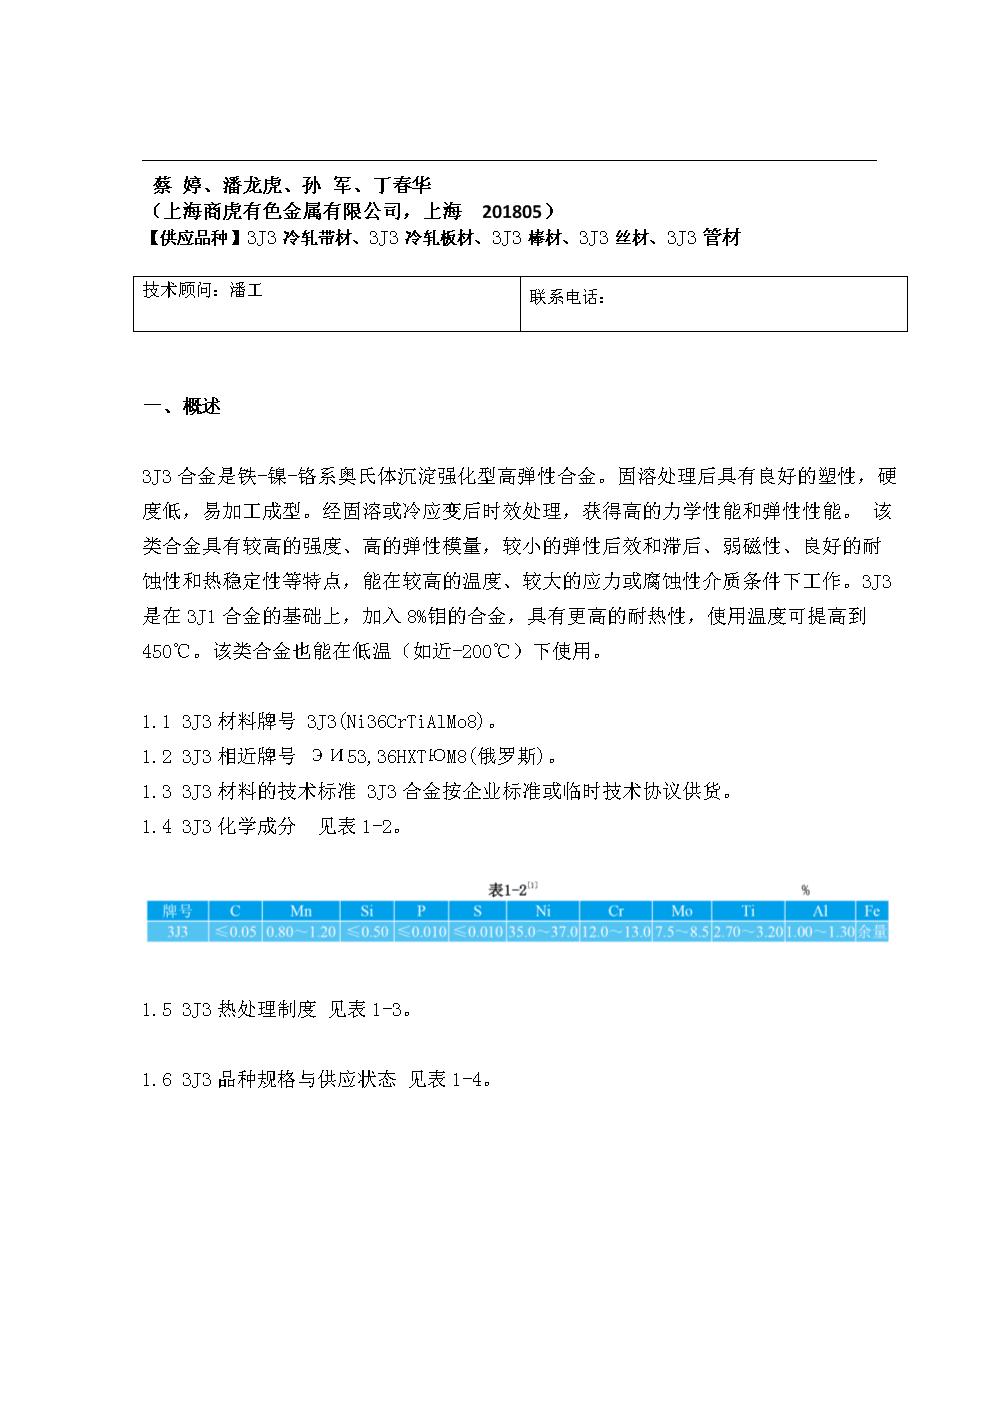 3J3高弹性合金-上海商虎合金技术.doc